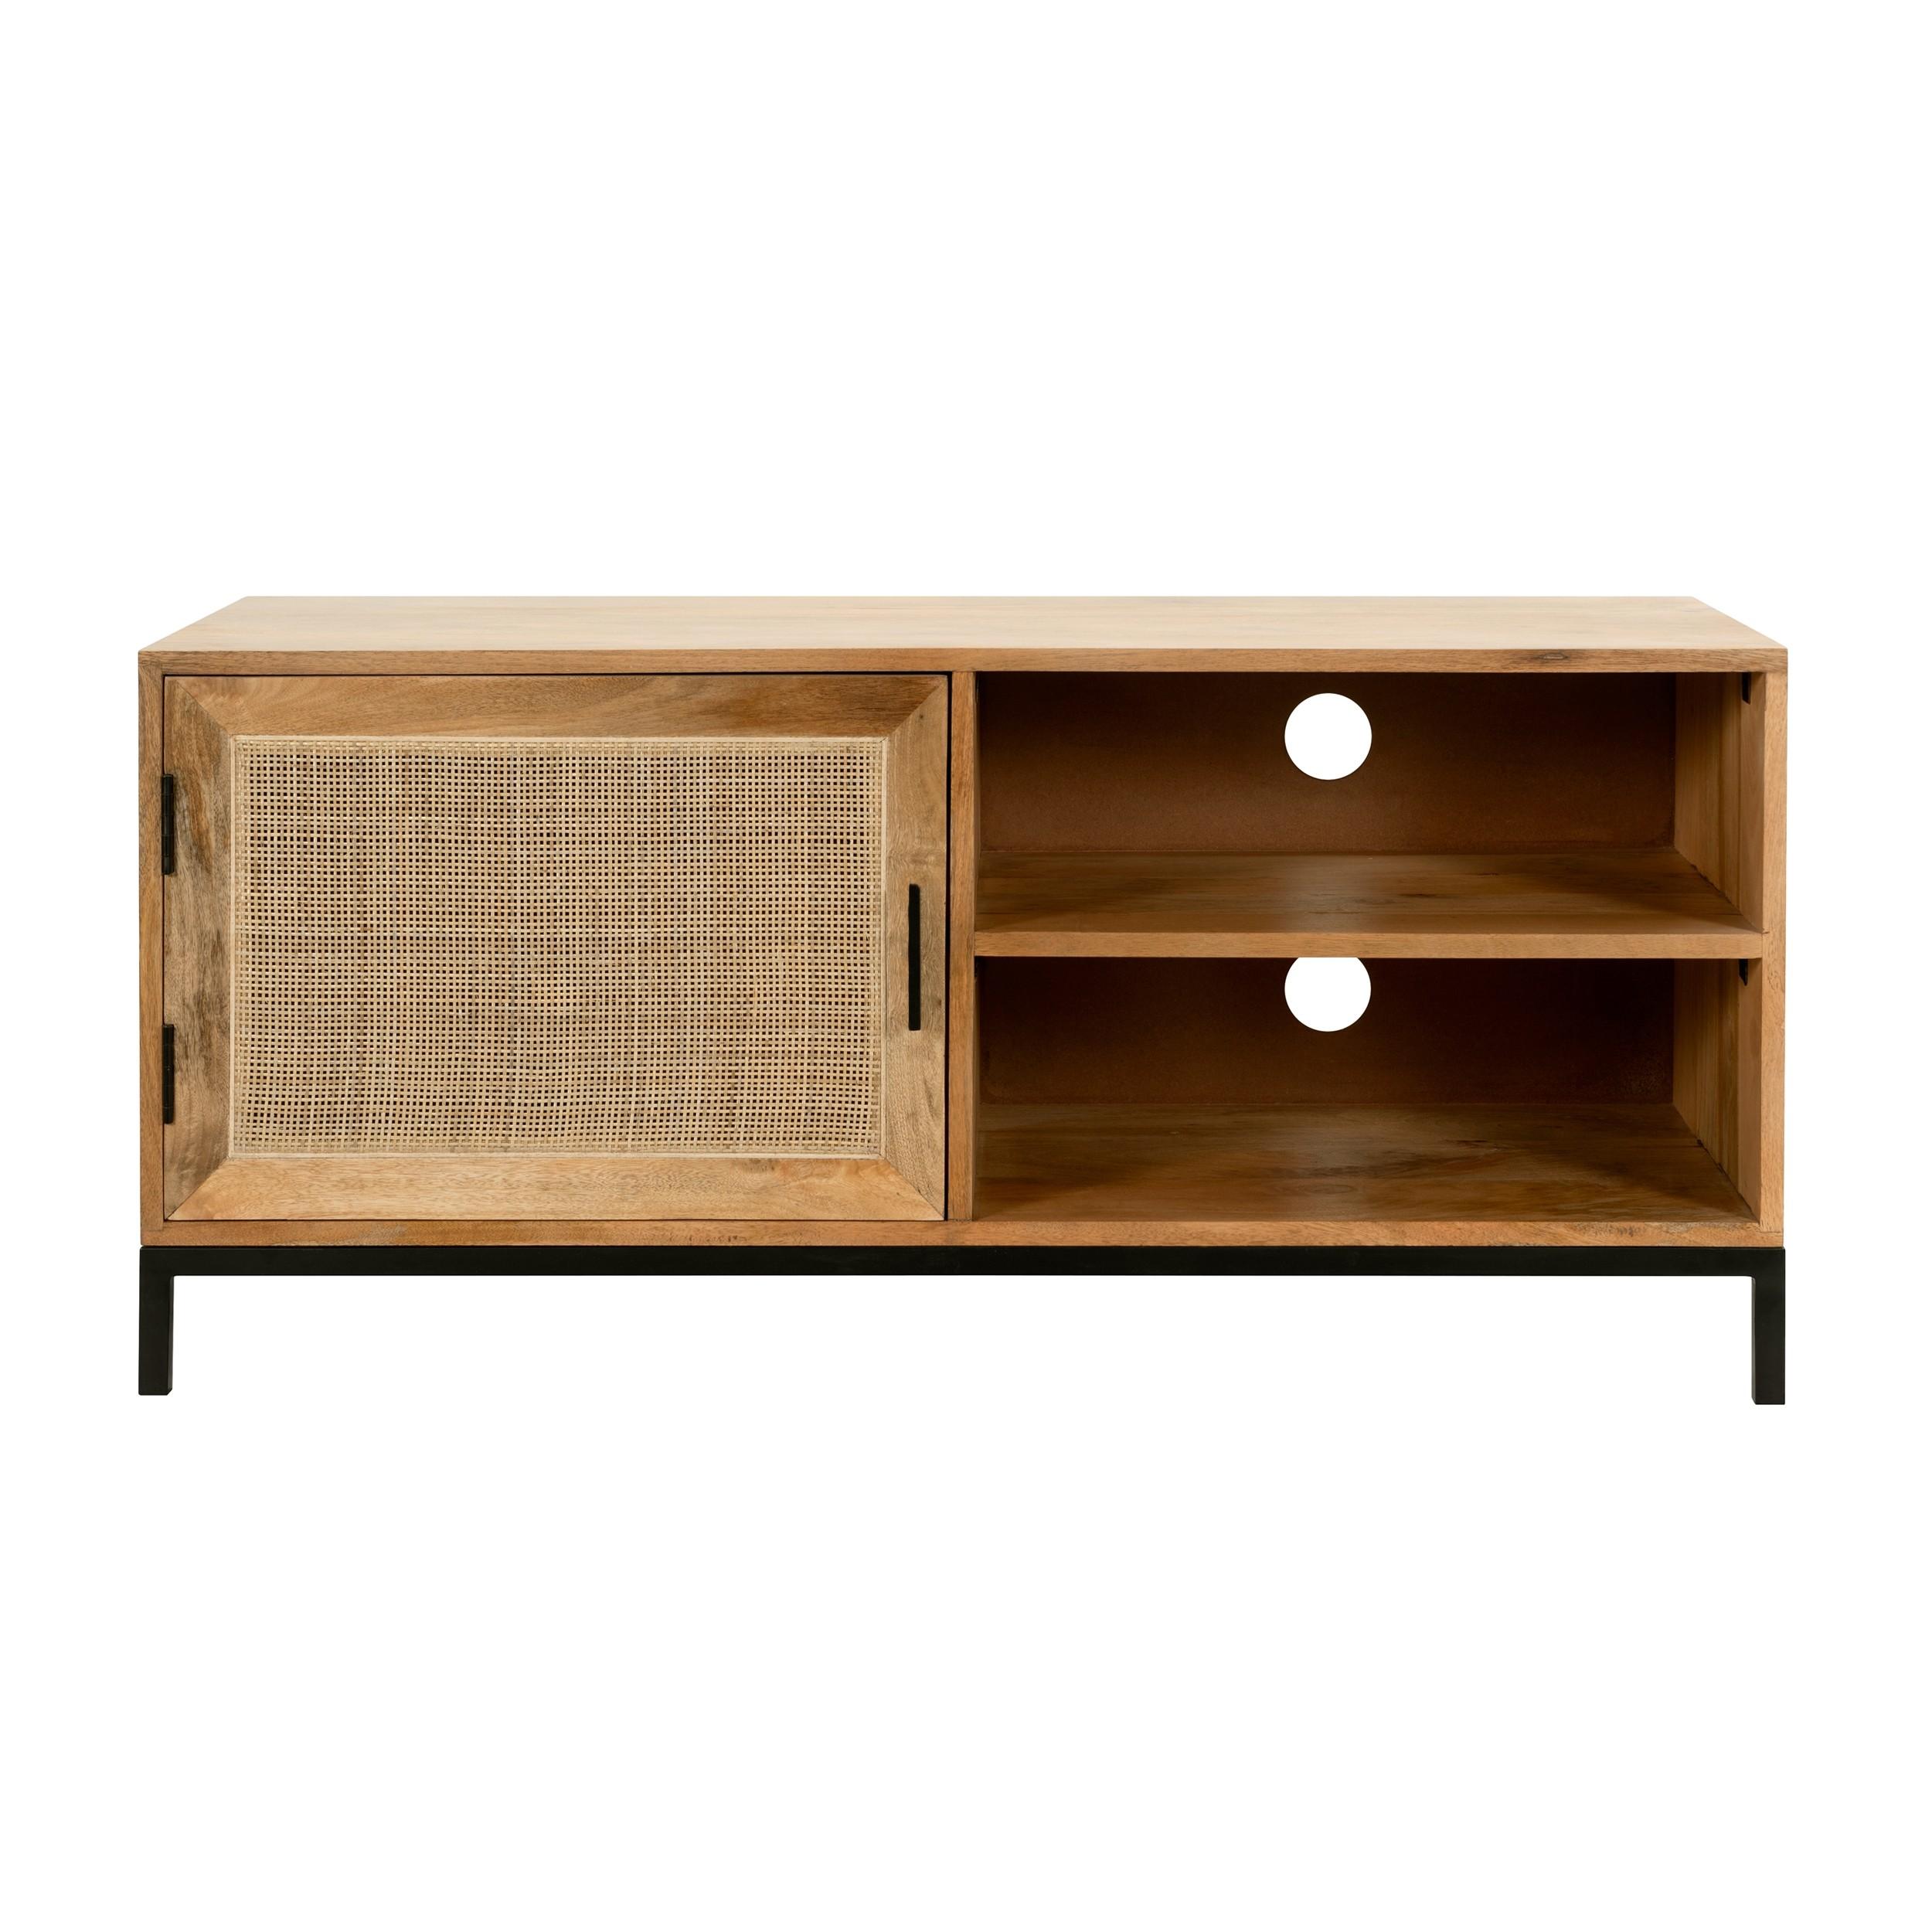 acheter meuble tv en cannage naturel